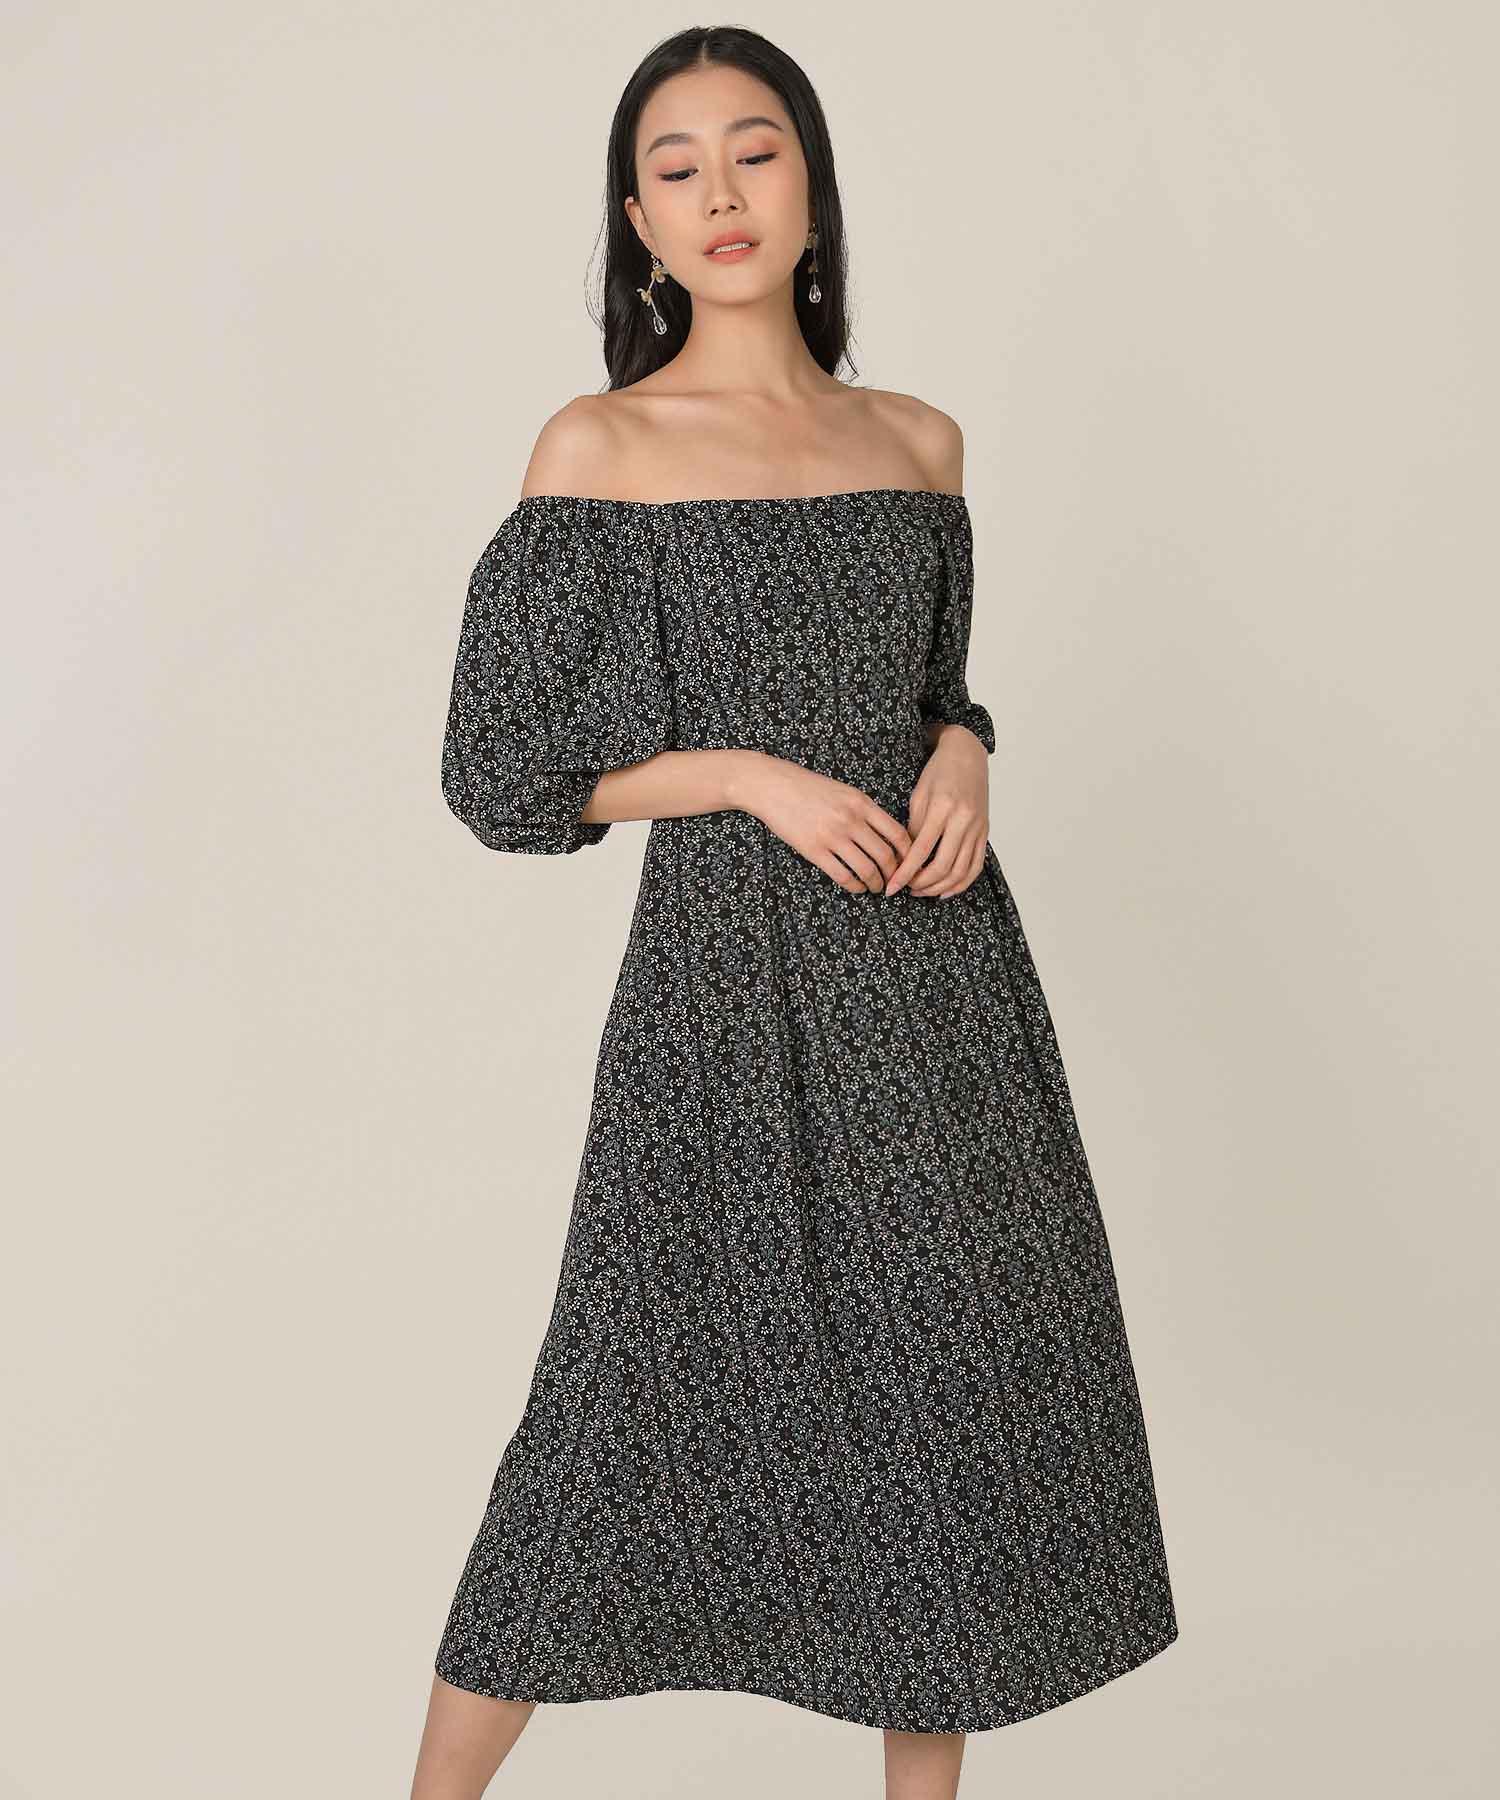 artesia-floral-motif-midaxi-dress-black-1